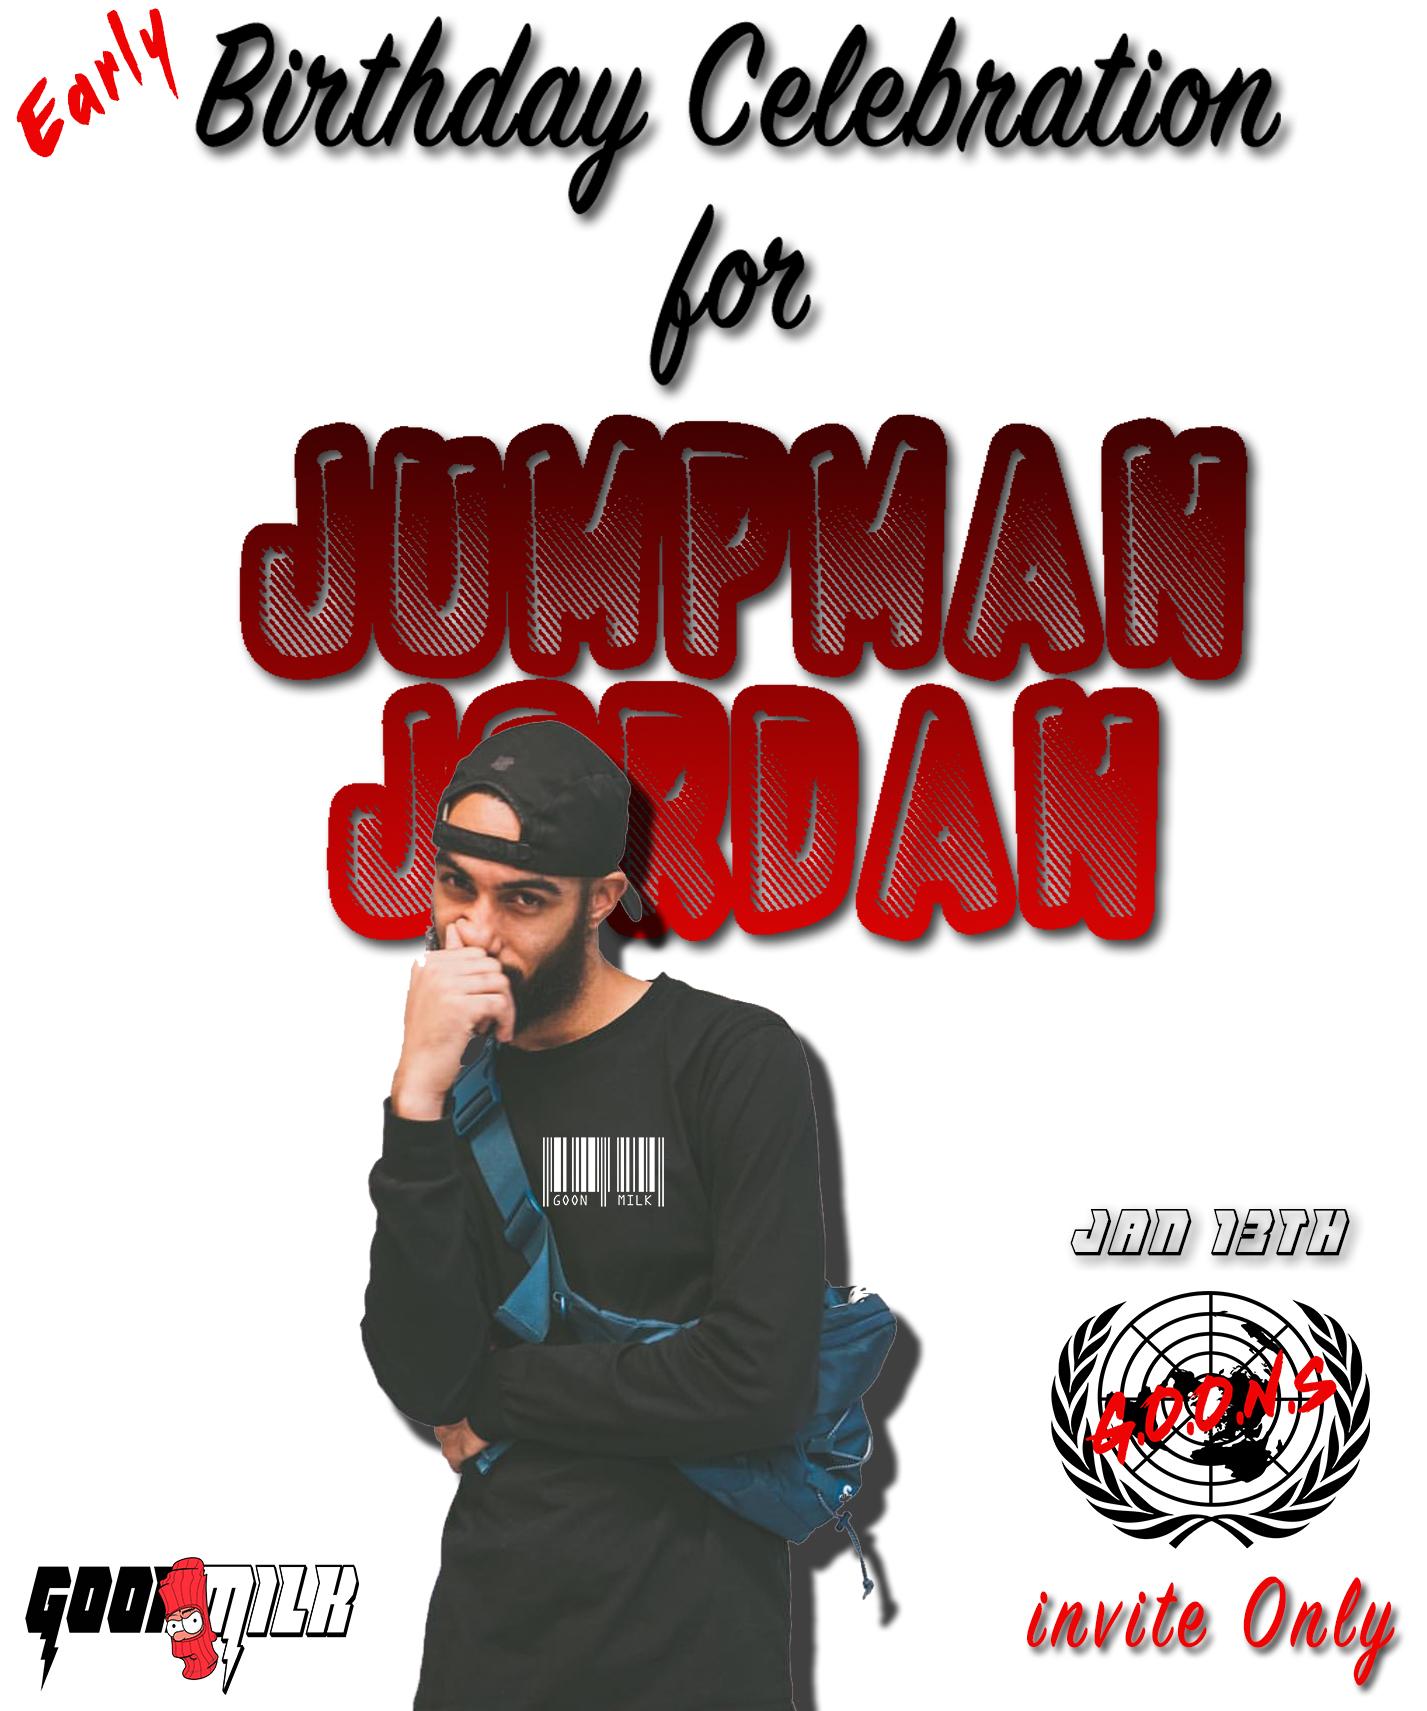 JordanBday.jpg